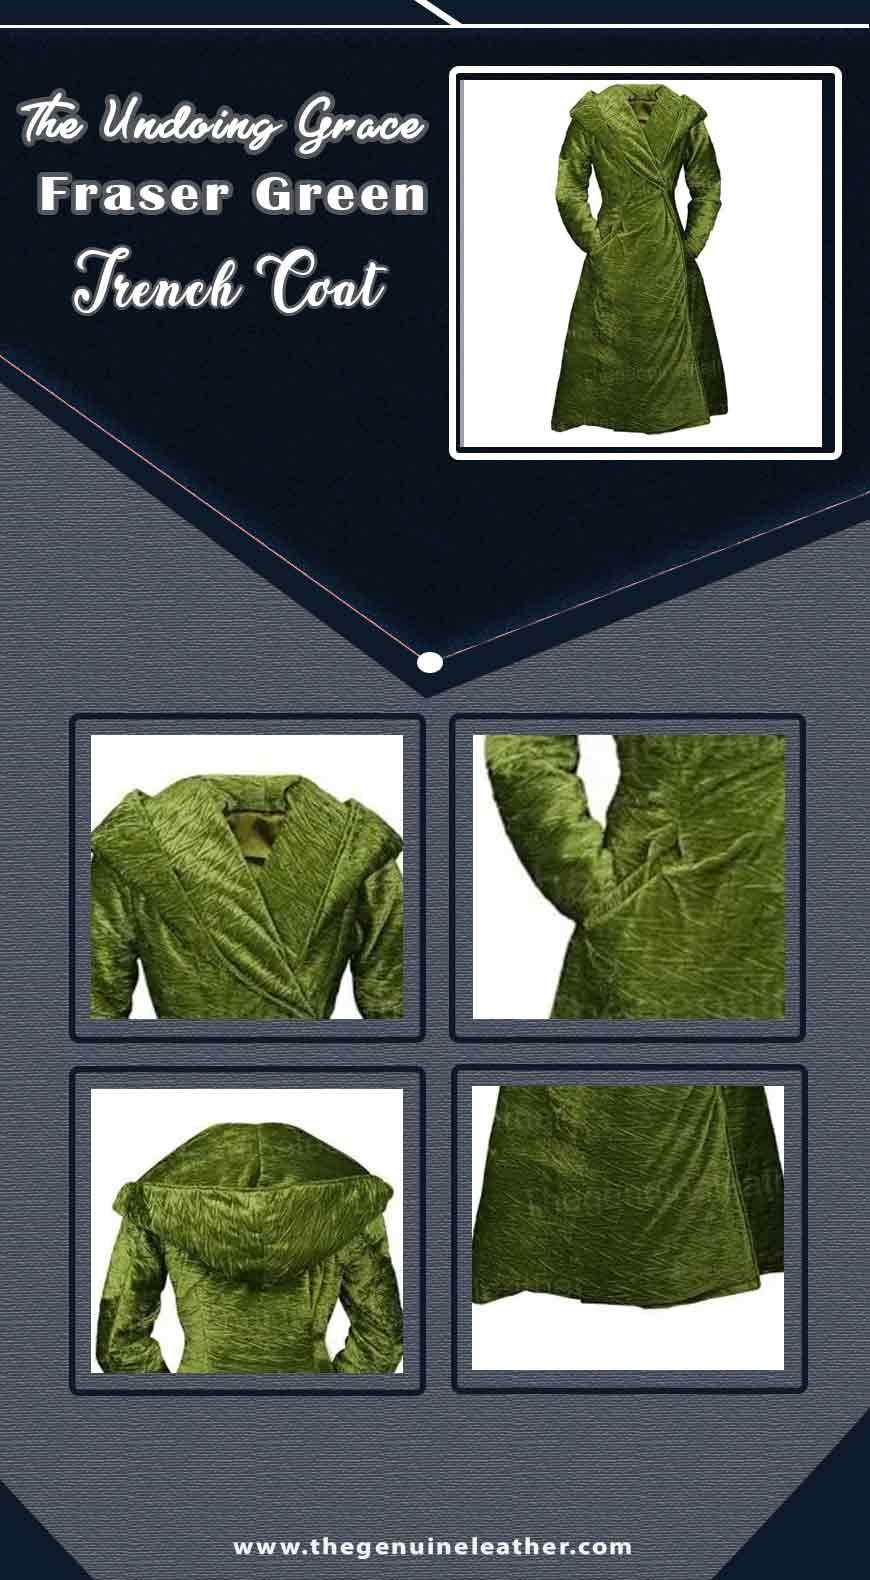 The Undoing Grace Fraser Green Trench Coat info